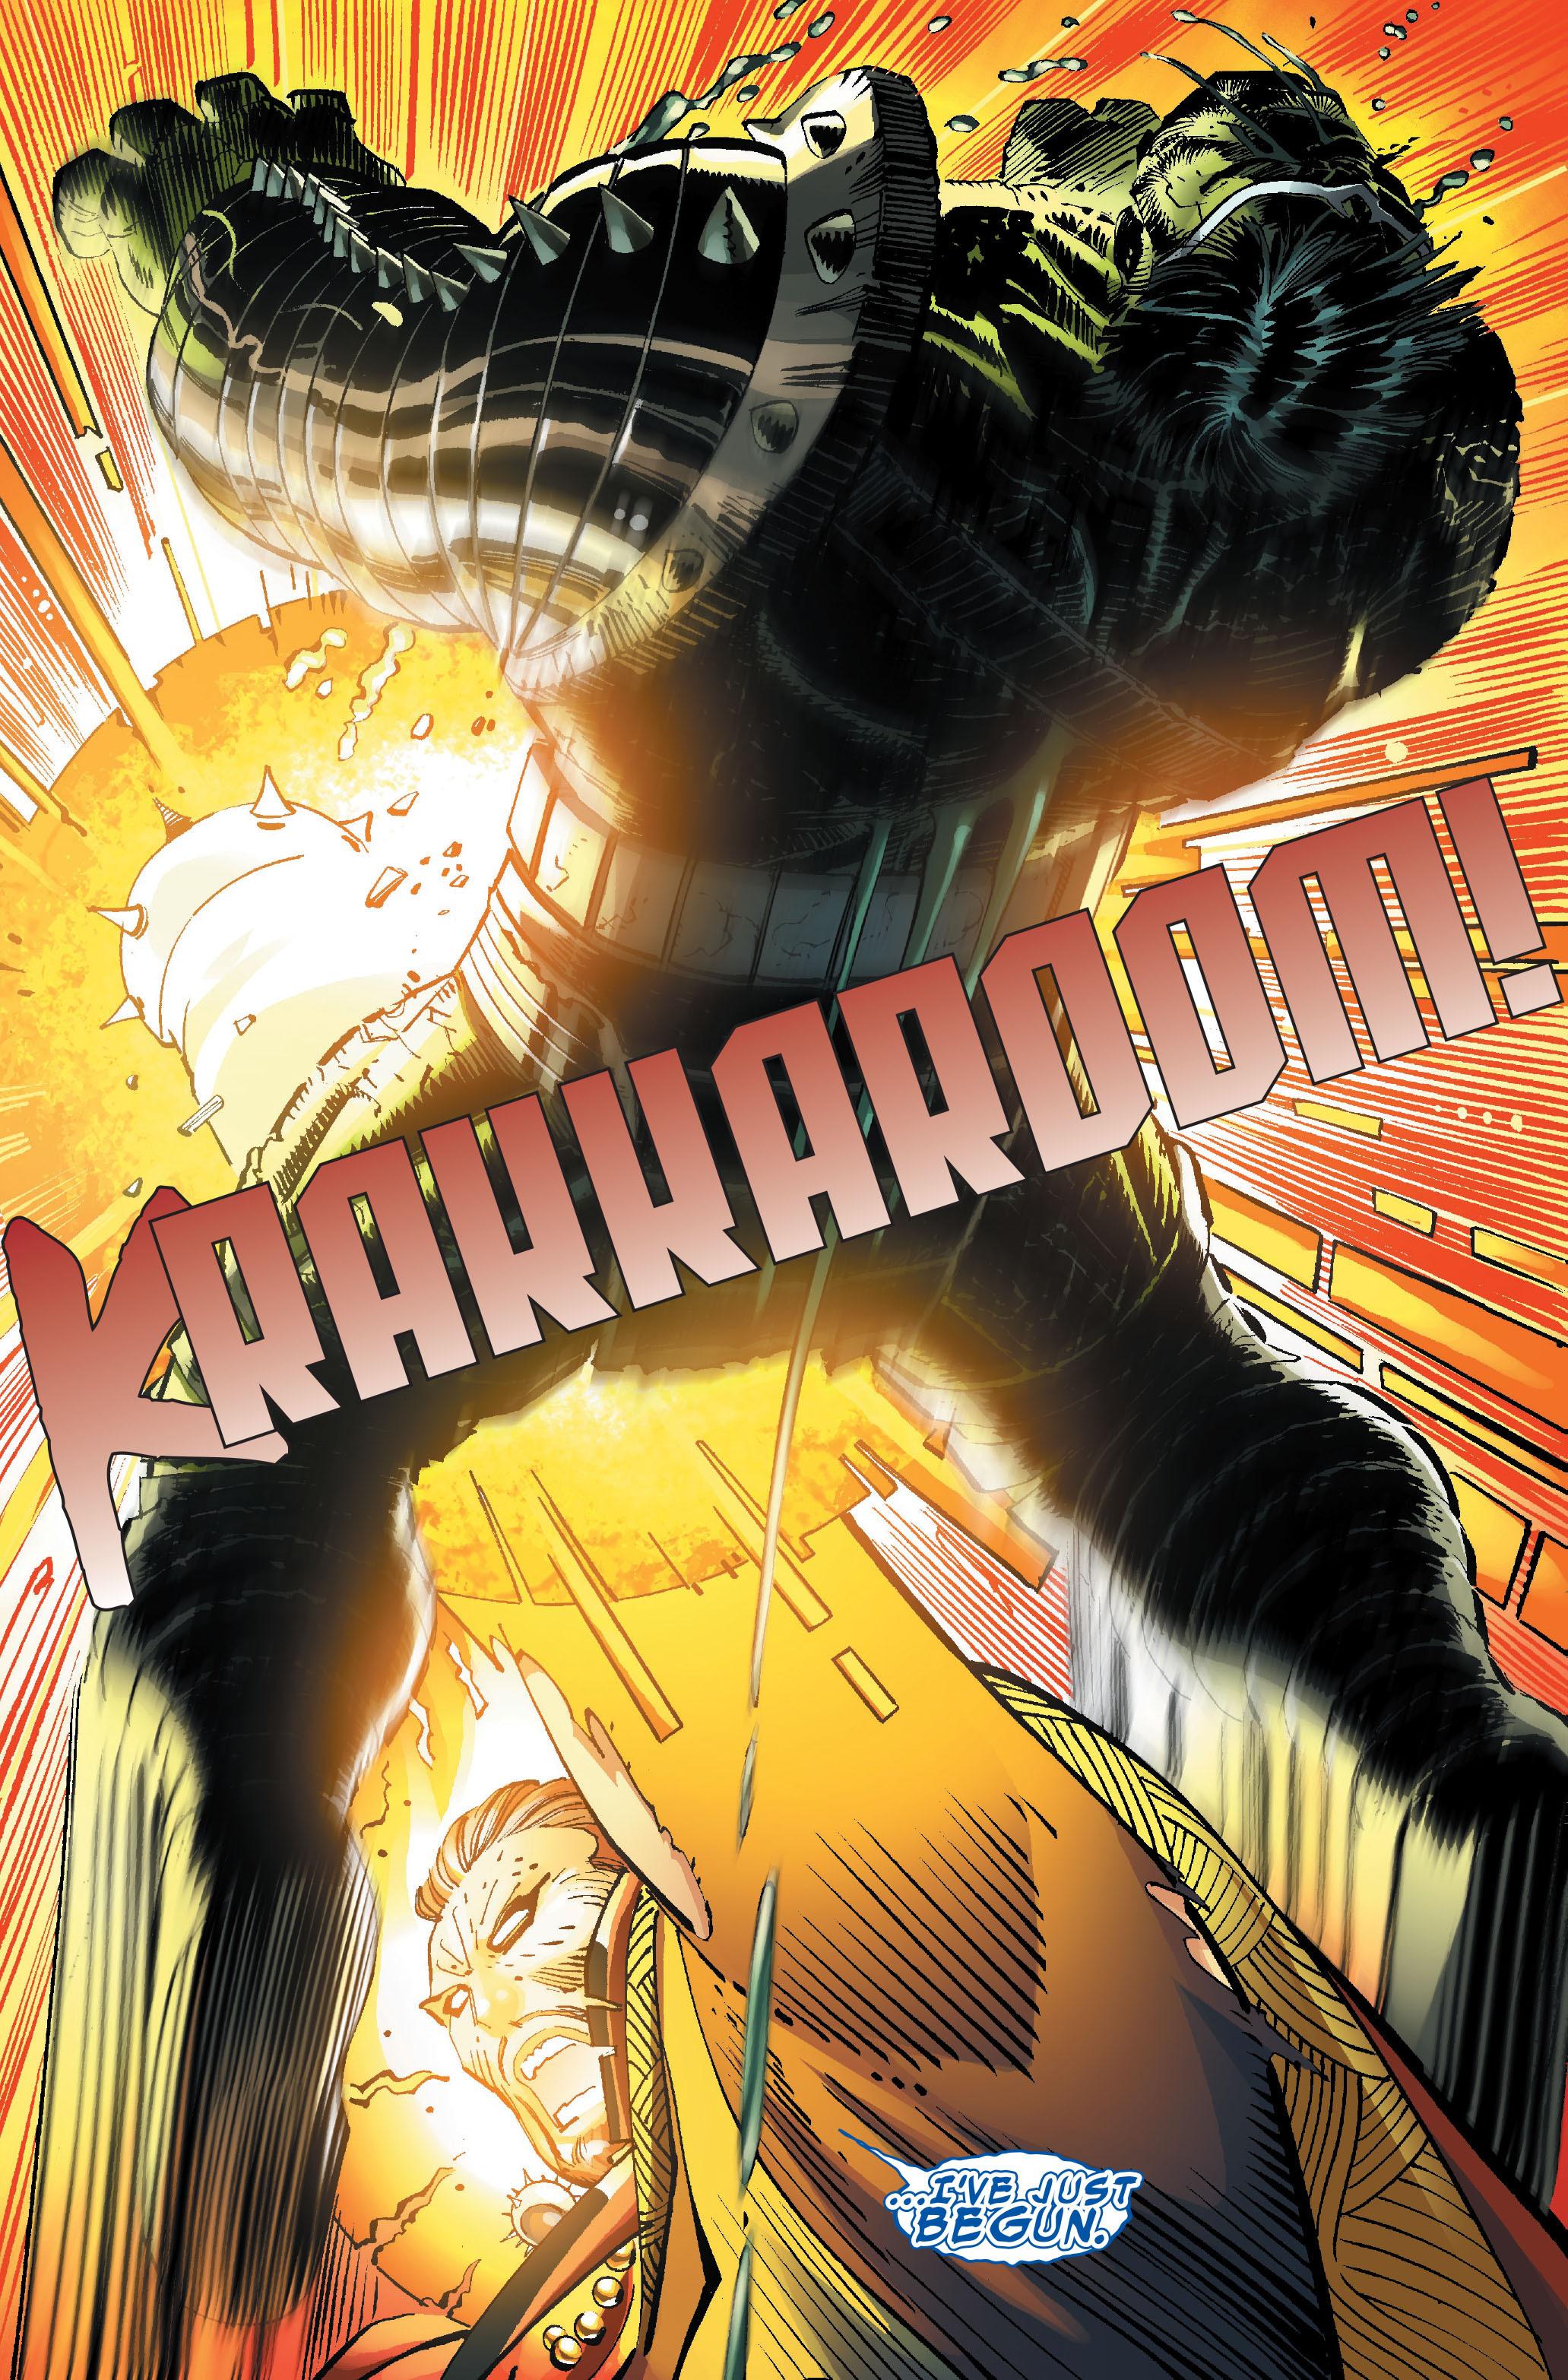 Read online World War Hulk comic -  Issue #4 - 7